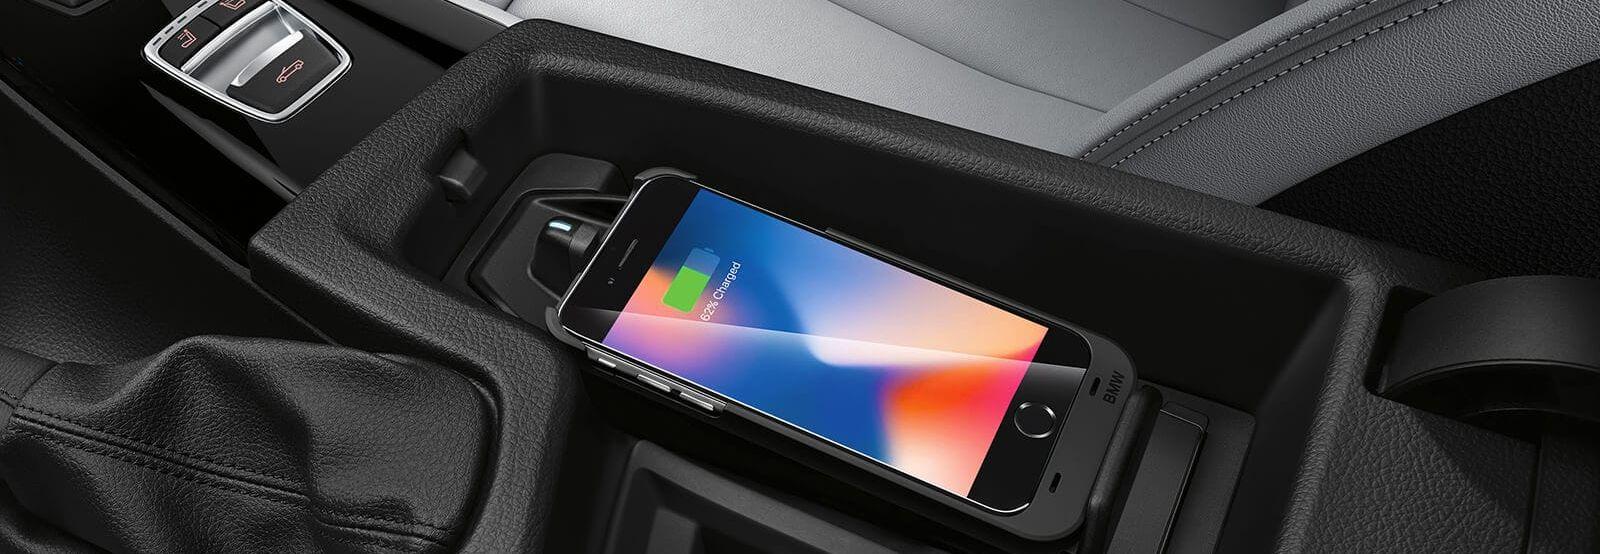 2020 M4 Wireless Charging